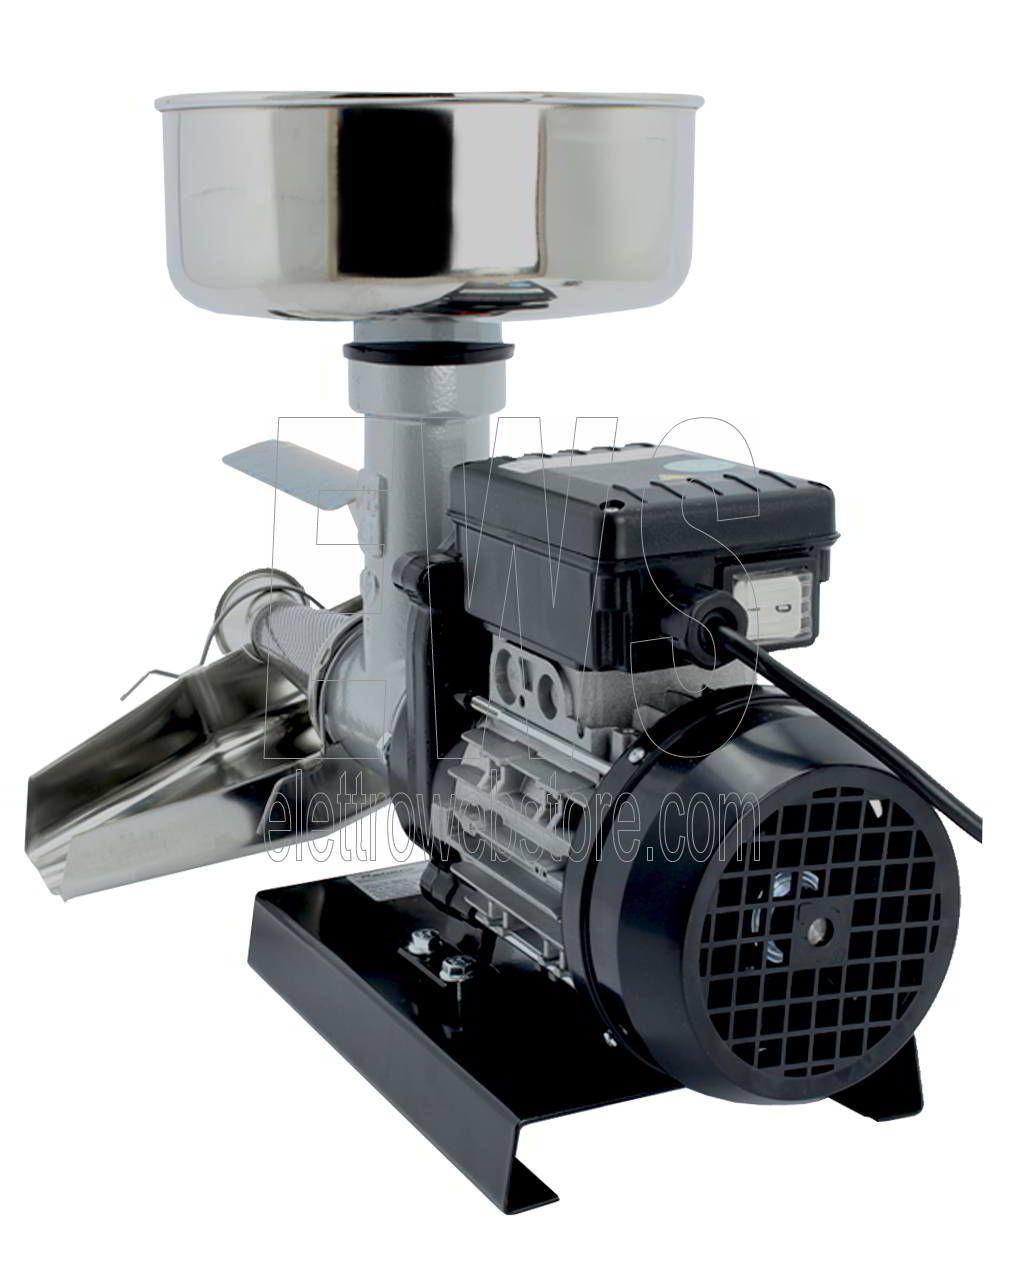 REBER Spremipomodoro elettrico n.5 HP 0,40 500 Watt 9004N